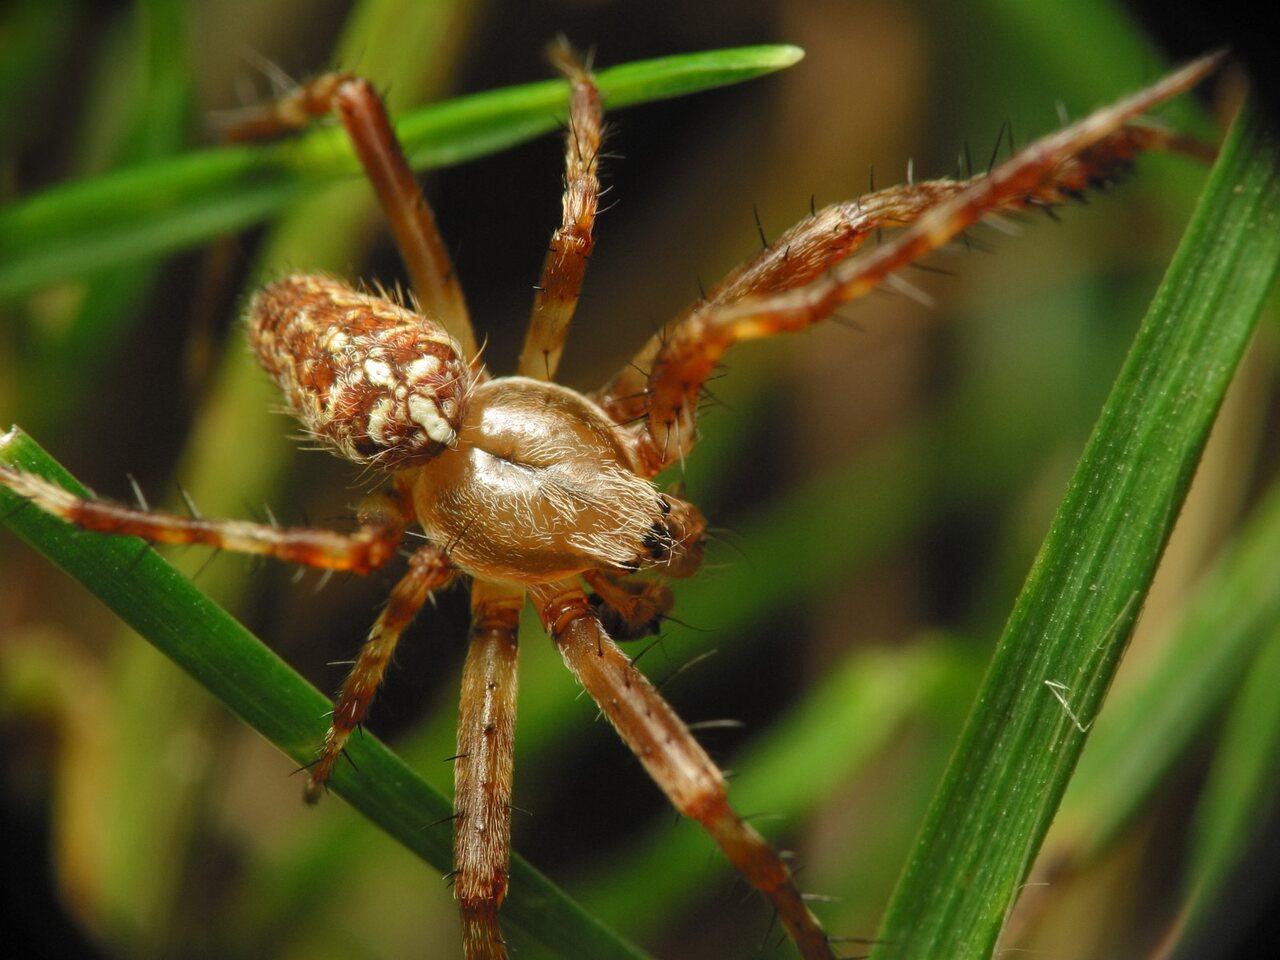 Araneus-diadematus-6628.jpg